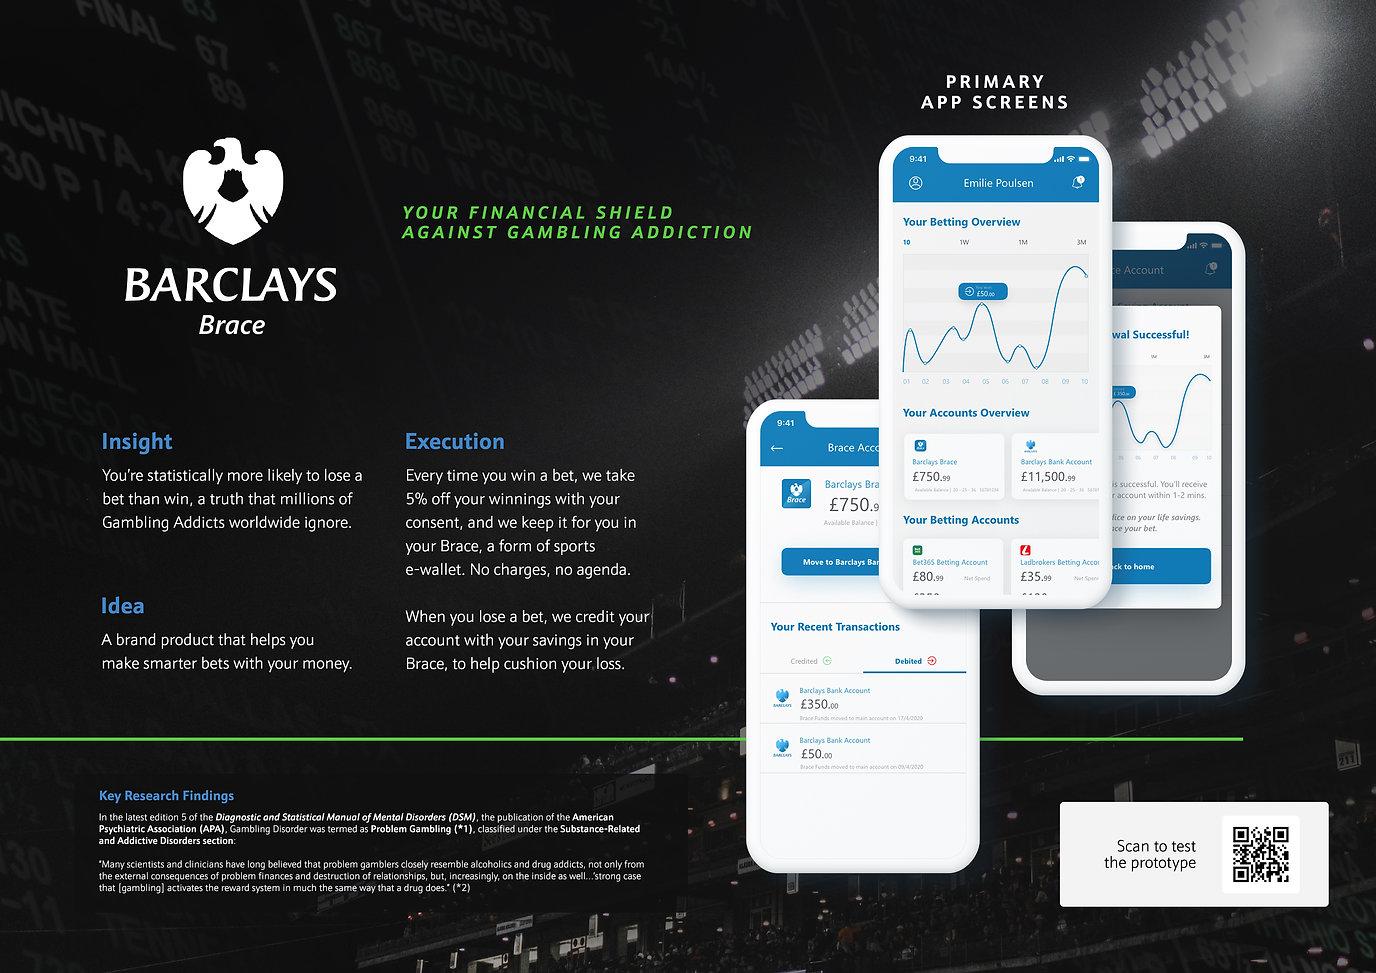 Barclays-Brace.jpg